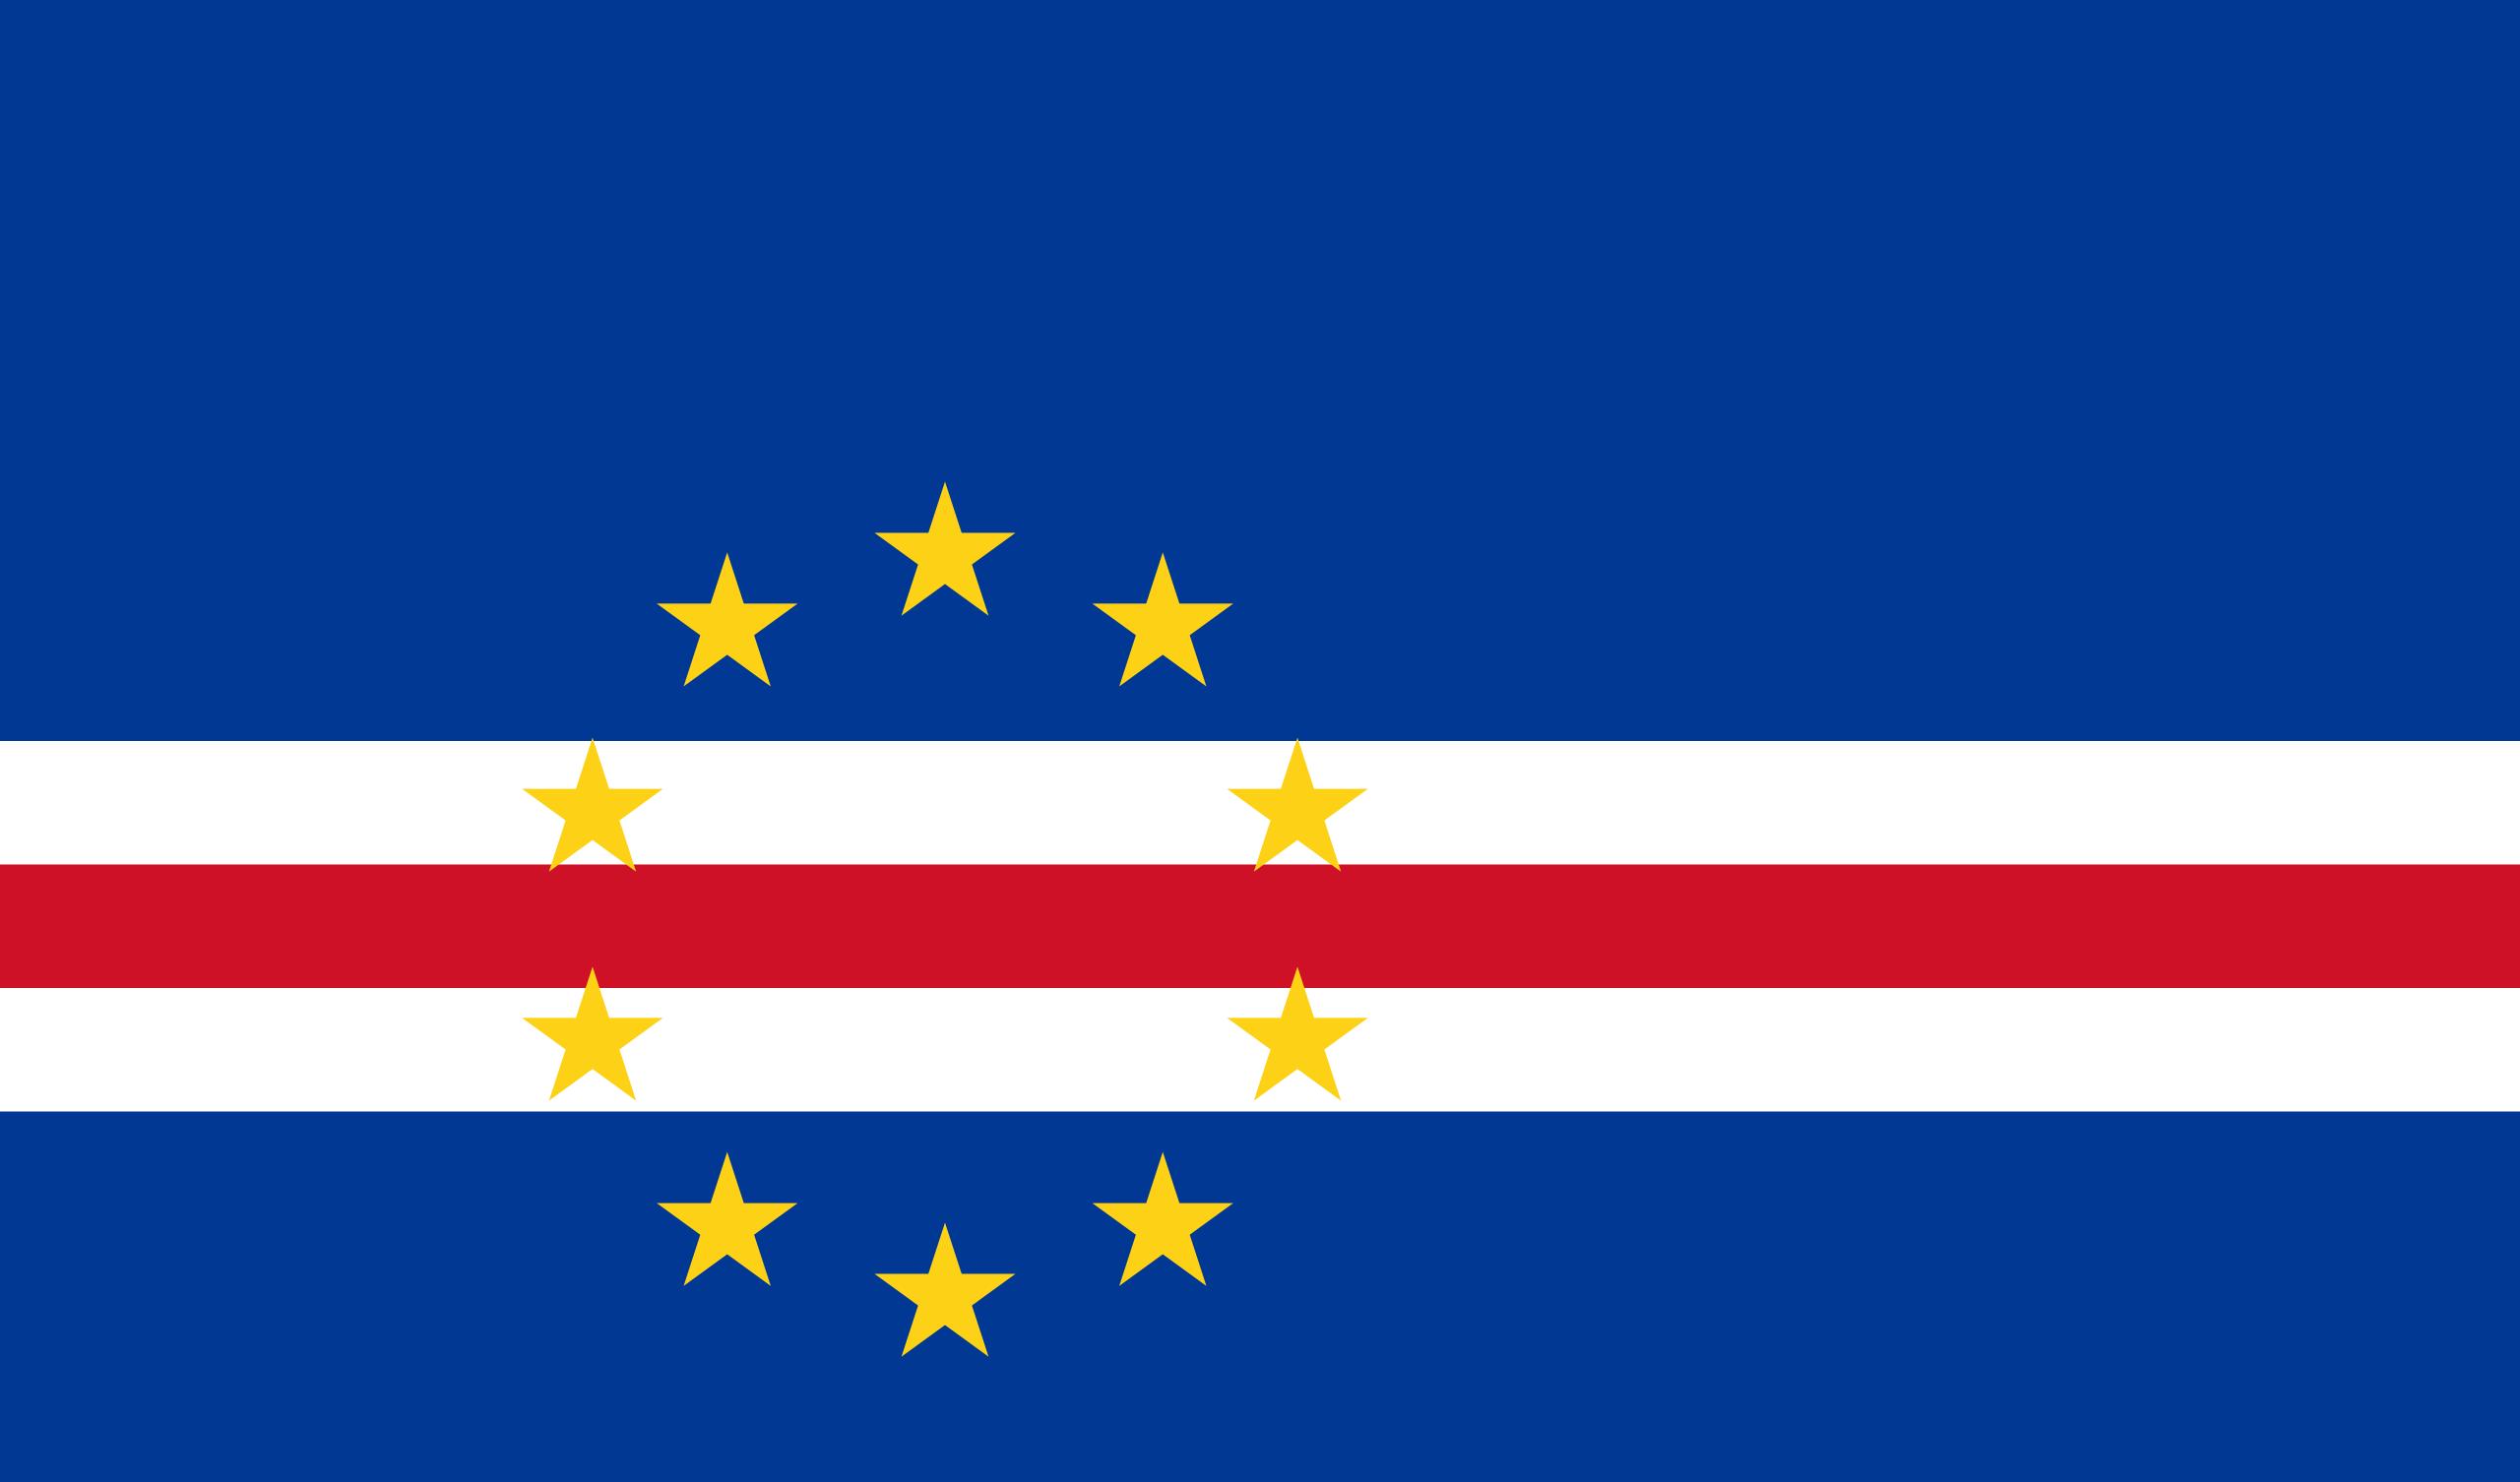 cabo verde, paese, emblema, logo, simbolo - Sfondi HD - Professor-falken.com